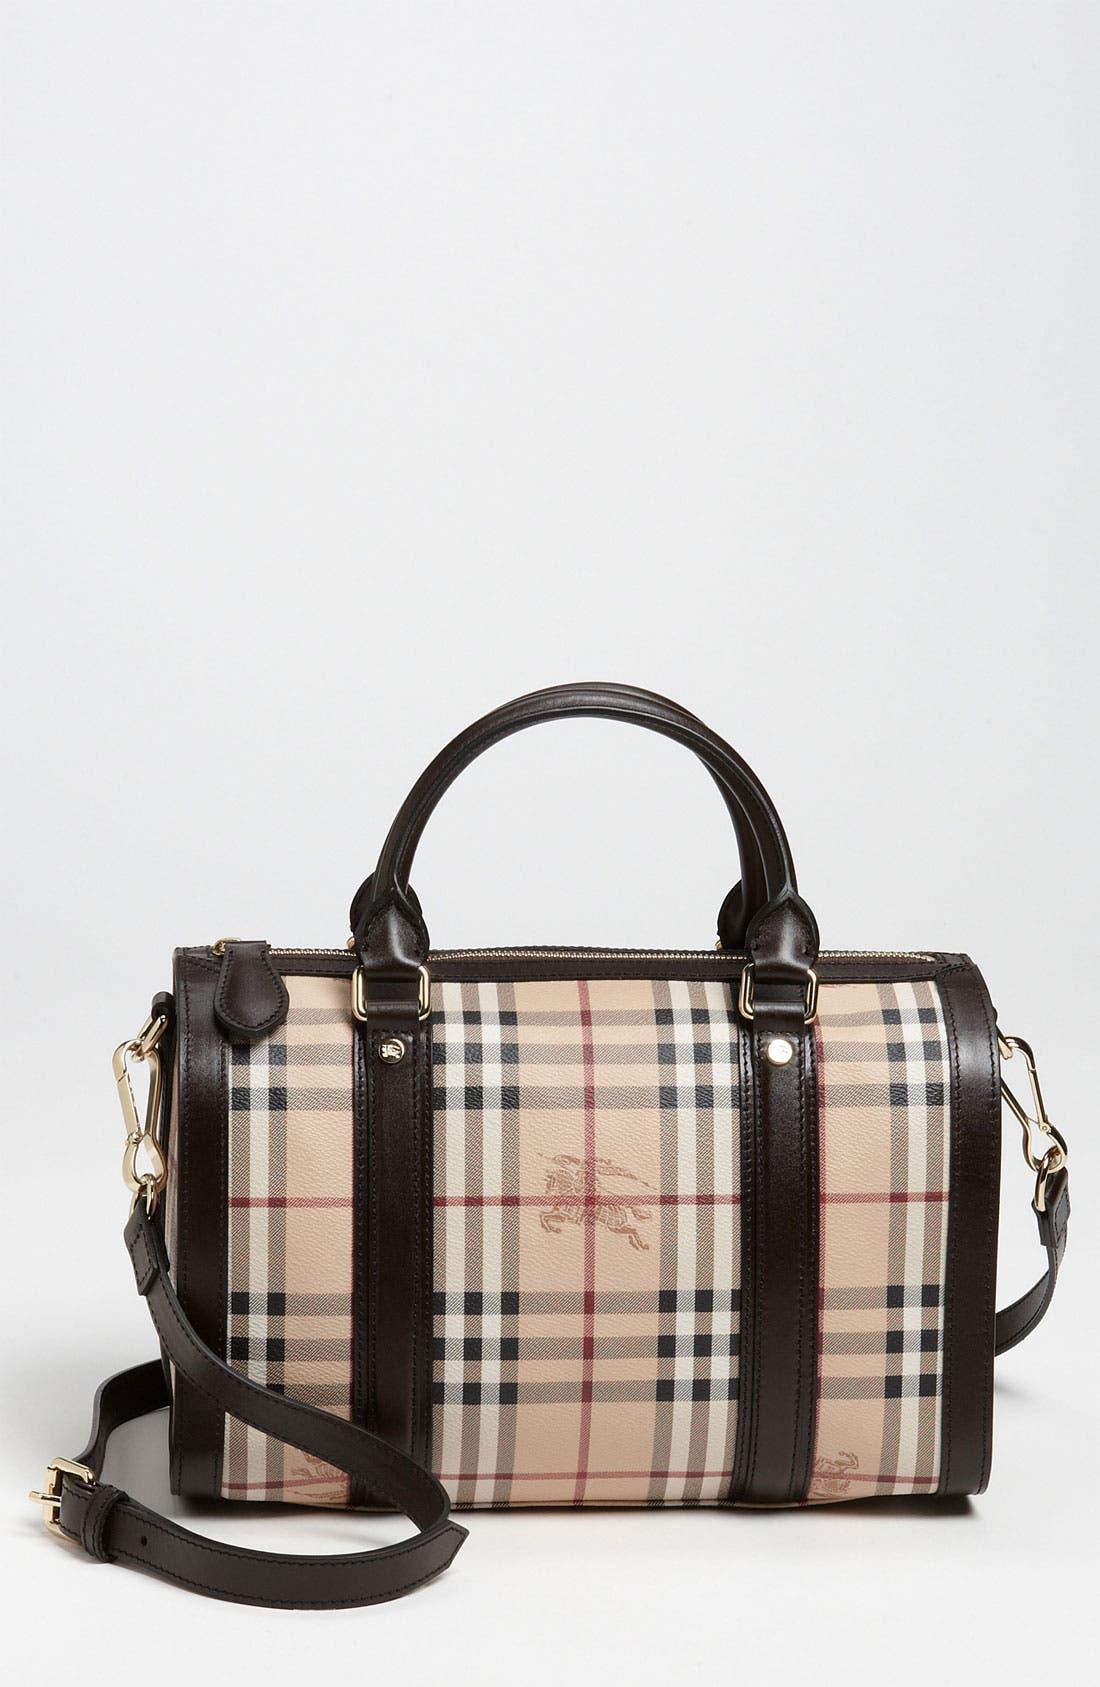 Main Image - Burberry 'Haymarket Check' Satchel, Medium